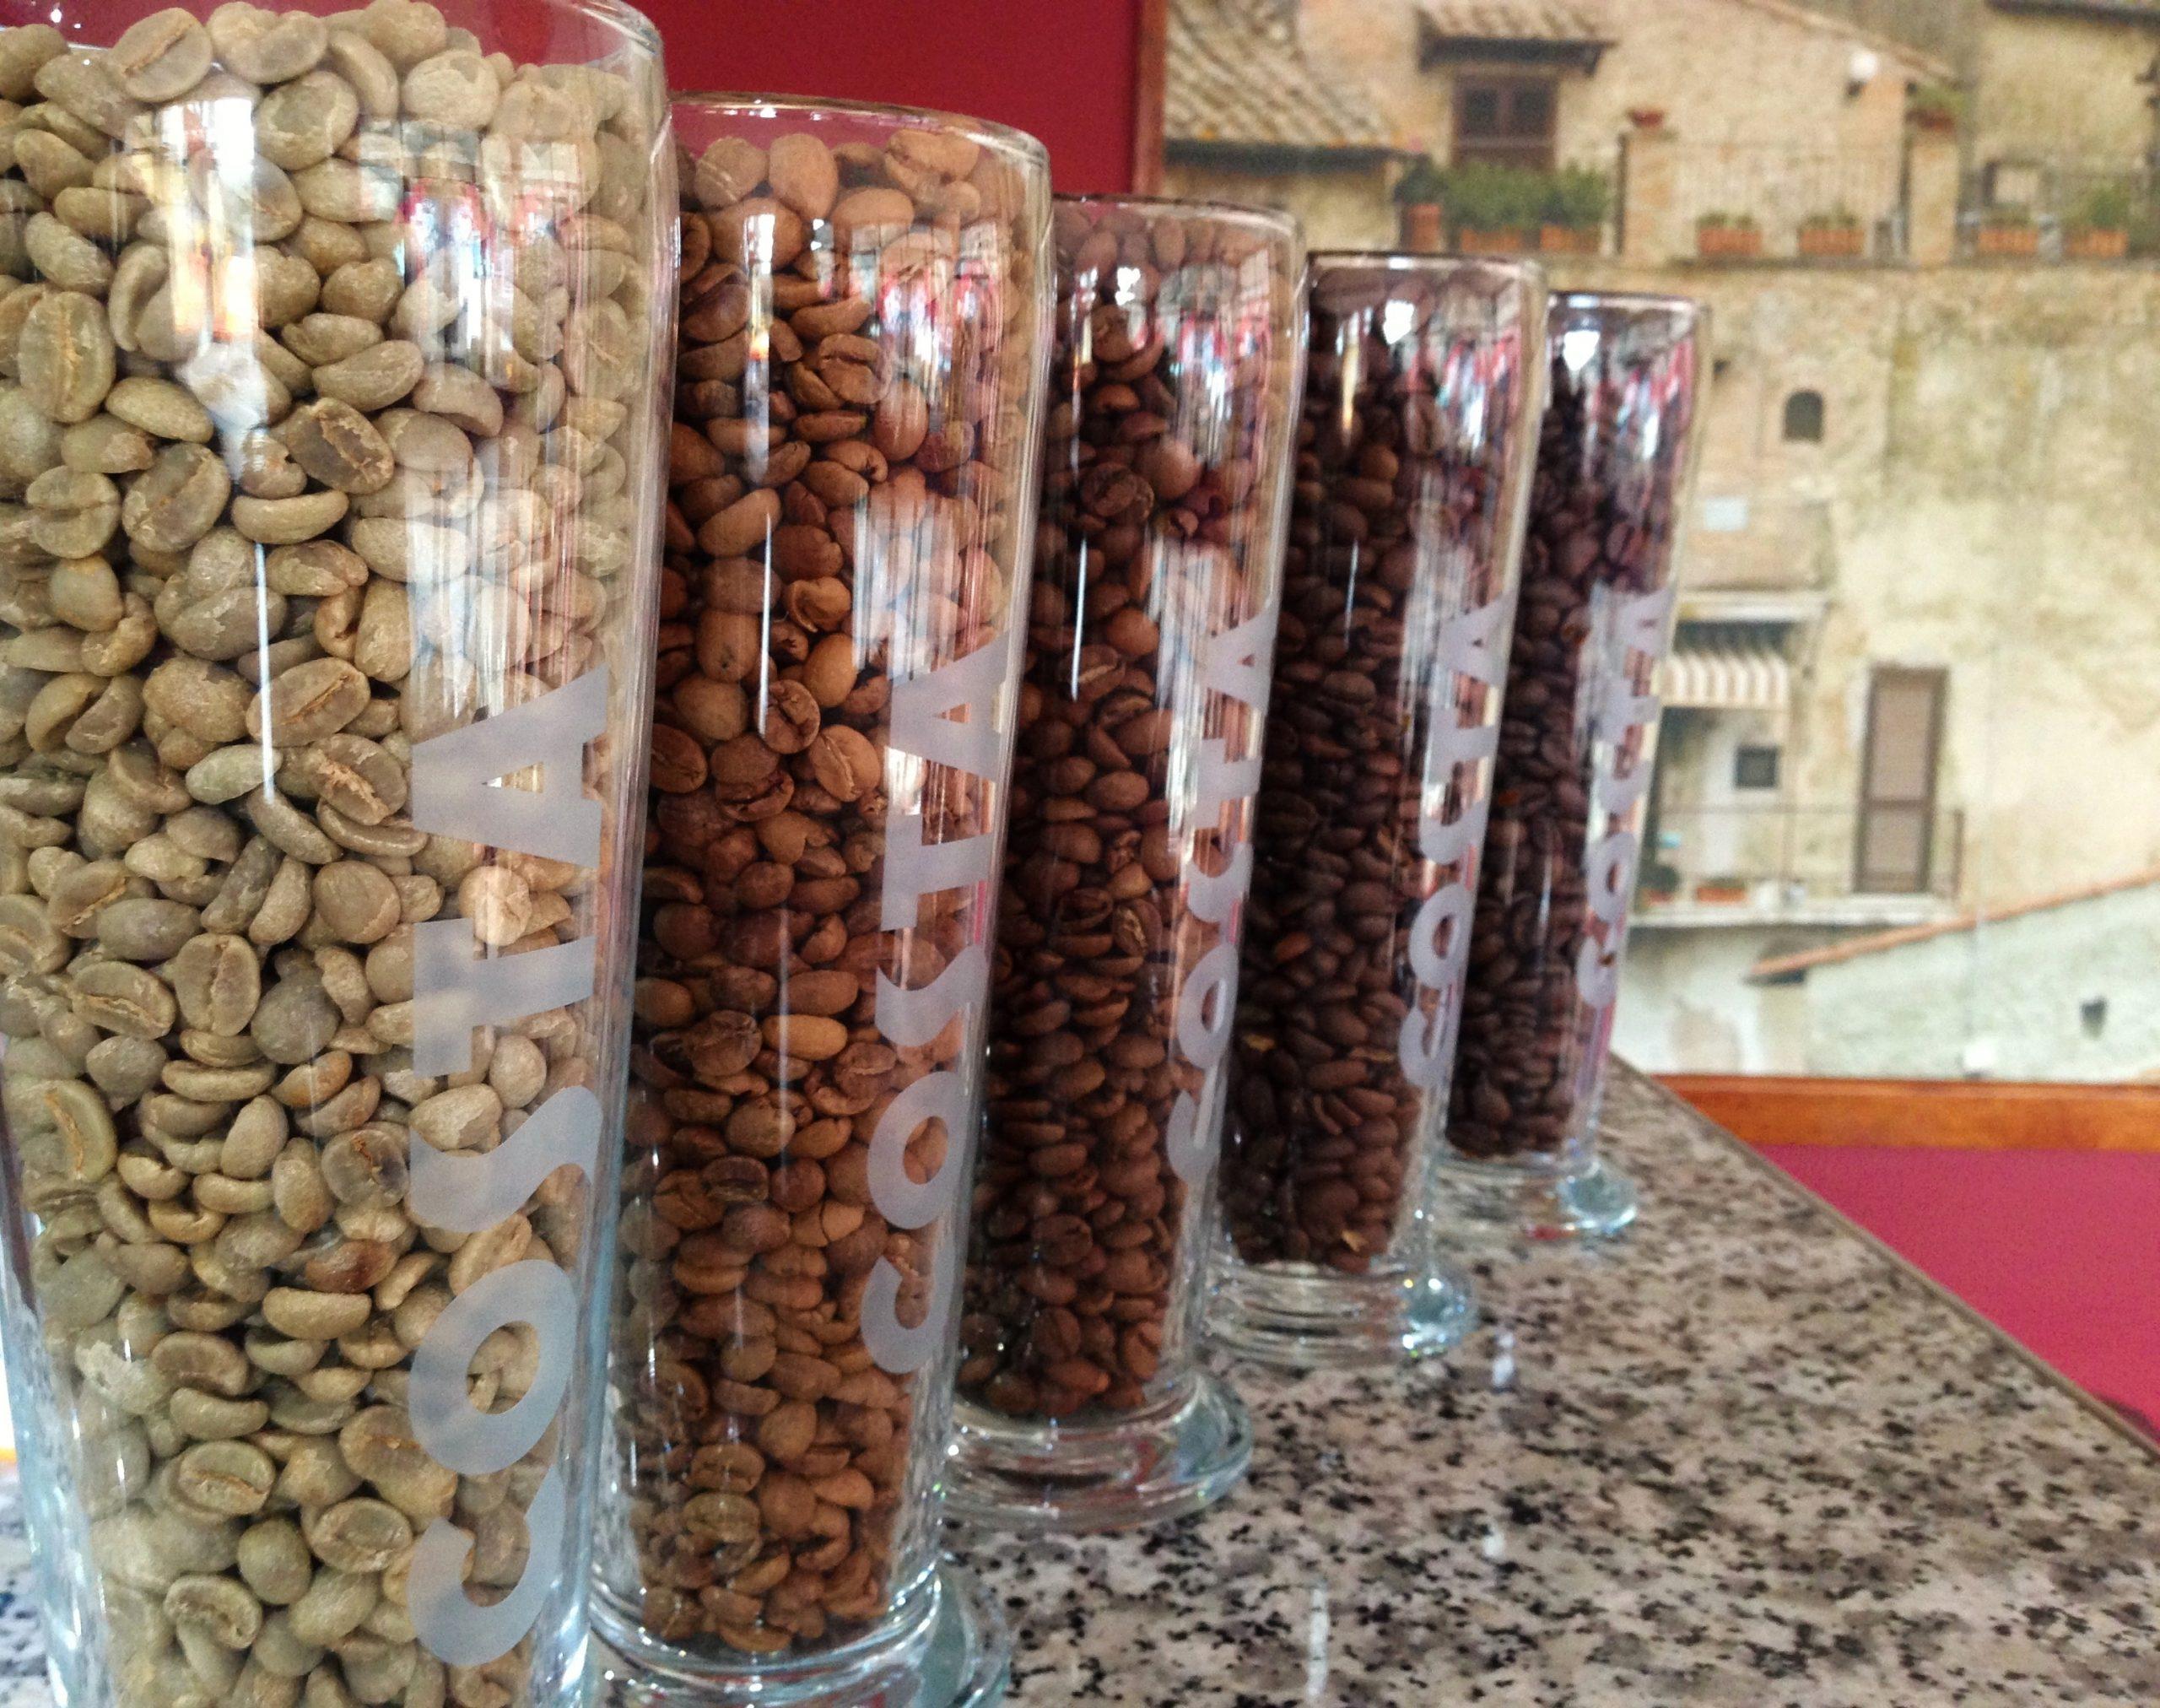 Costa coffee, coffee beans, coffee bean jar